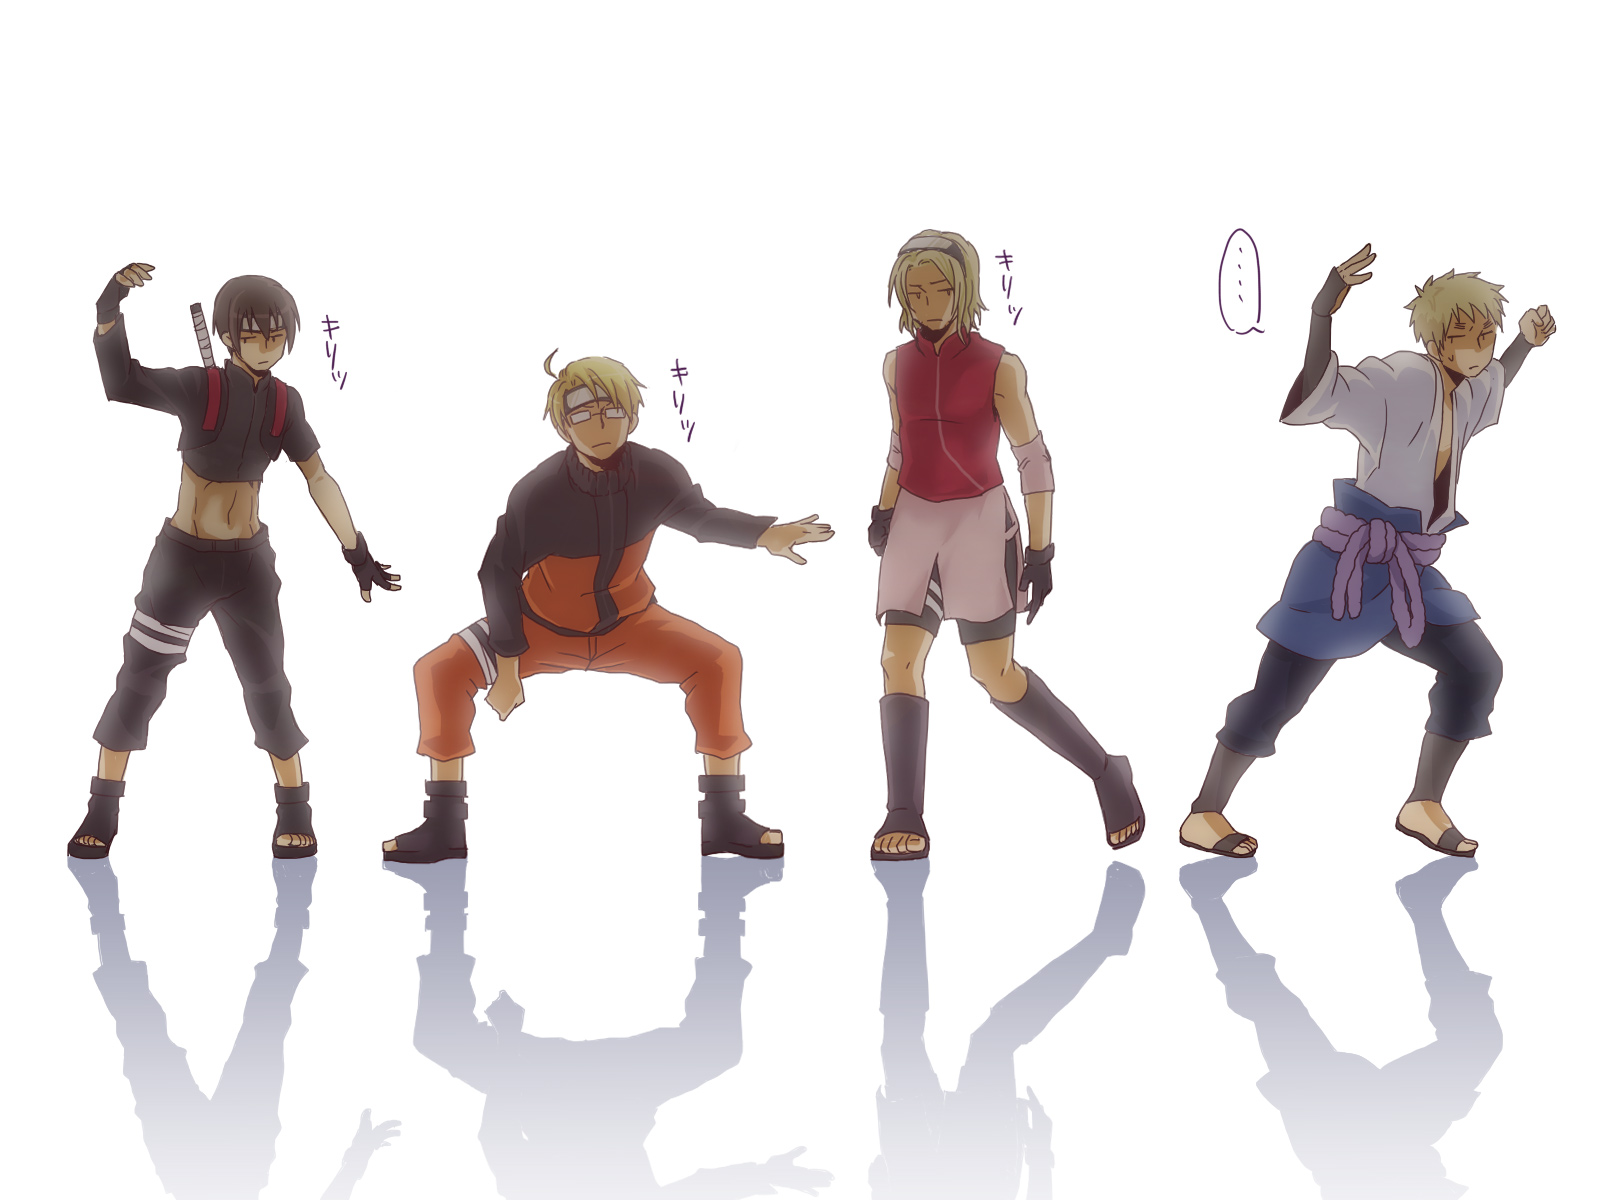 Axis Powers Hetalia Japan Kiku Honda anime boys l 1000x676